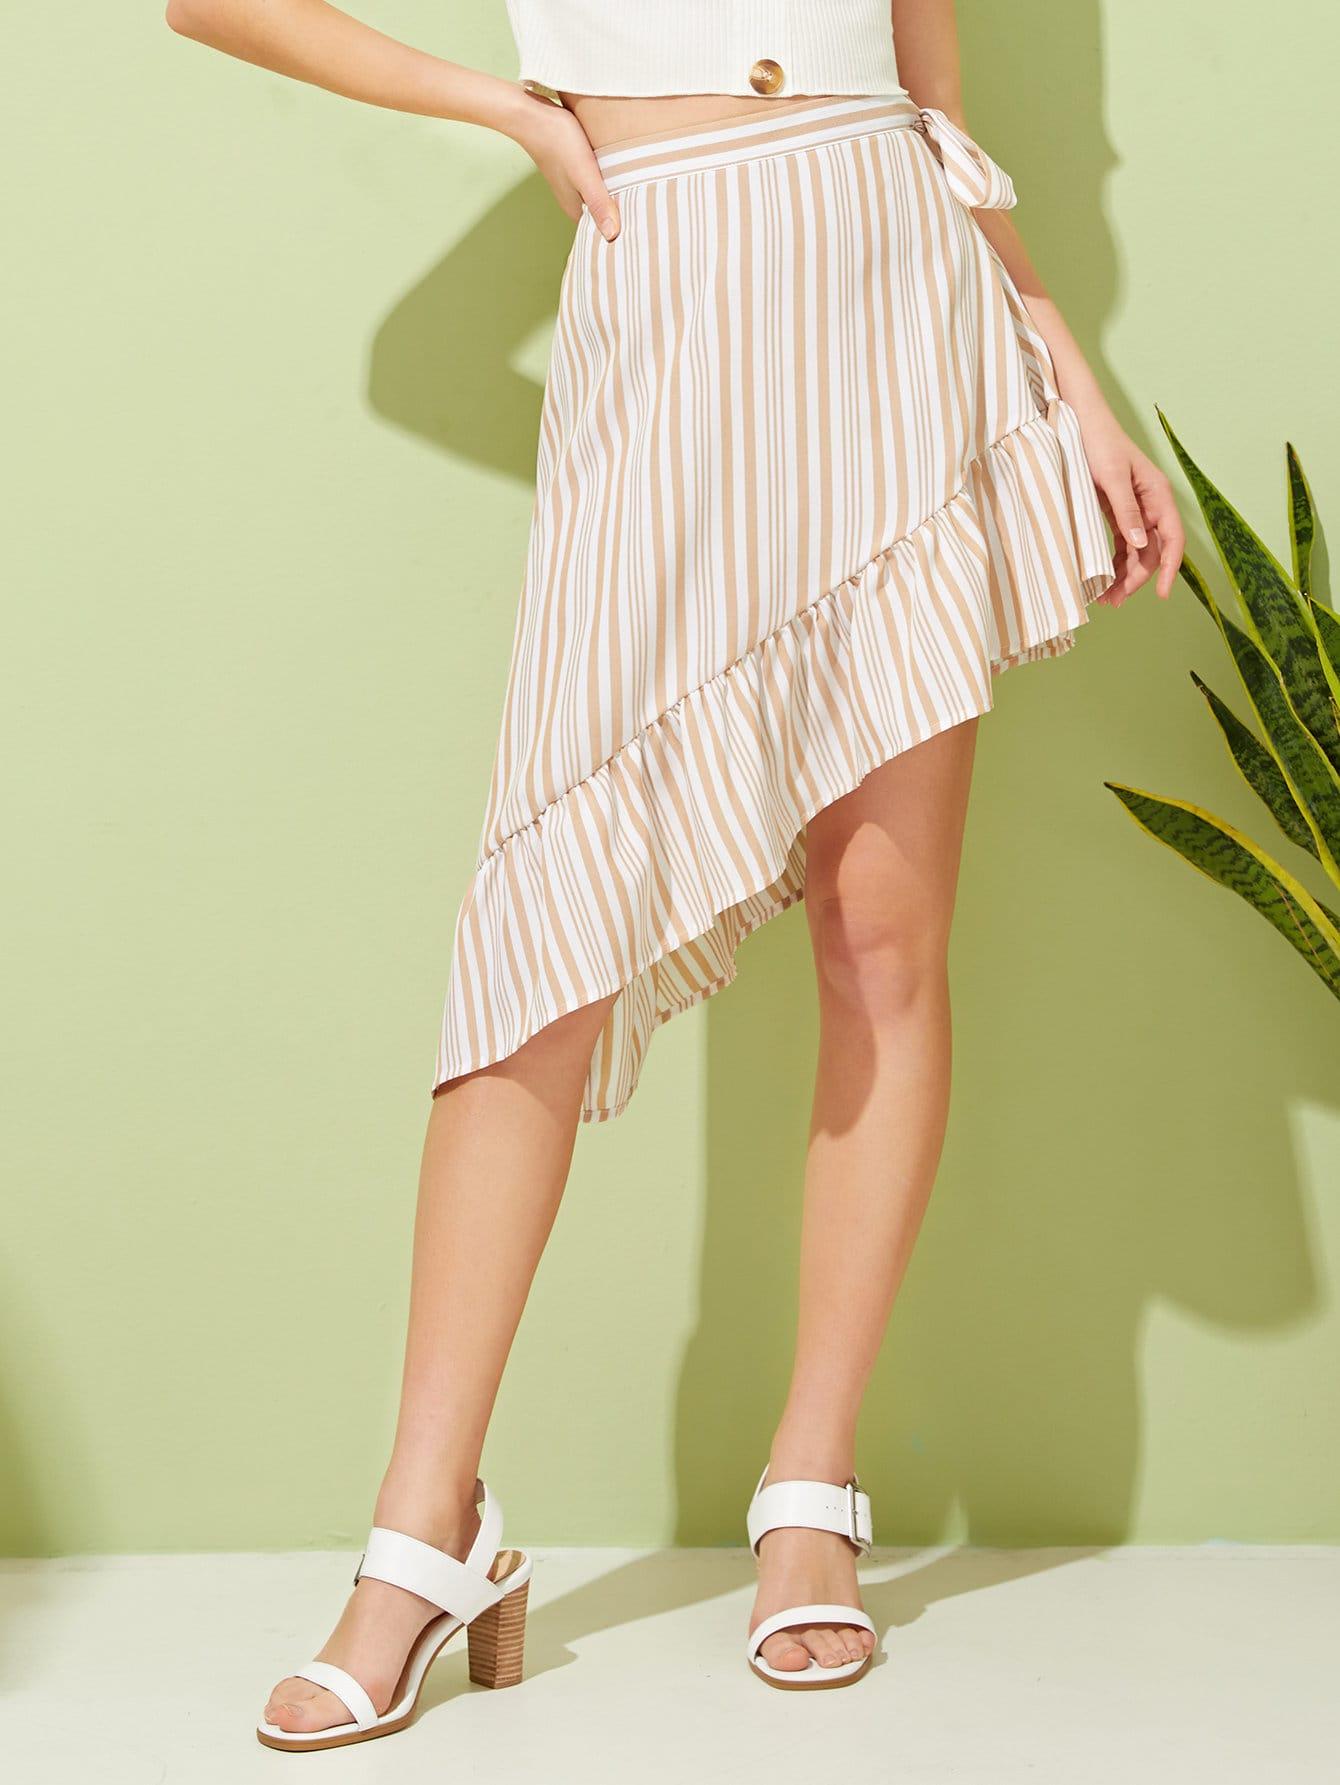 Фото - Асимметричная юбка в полоску с оборками от SheIn цвет многоцветный